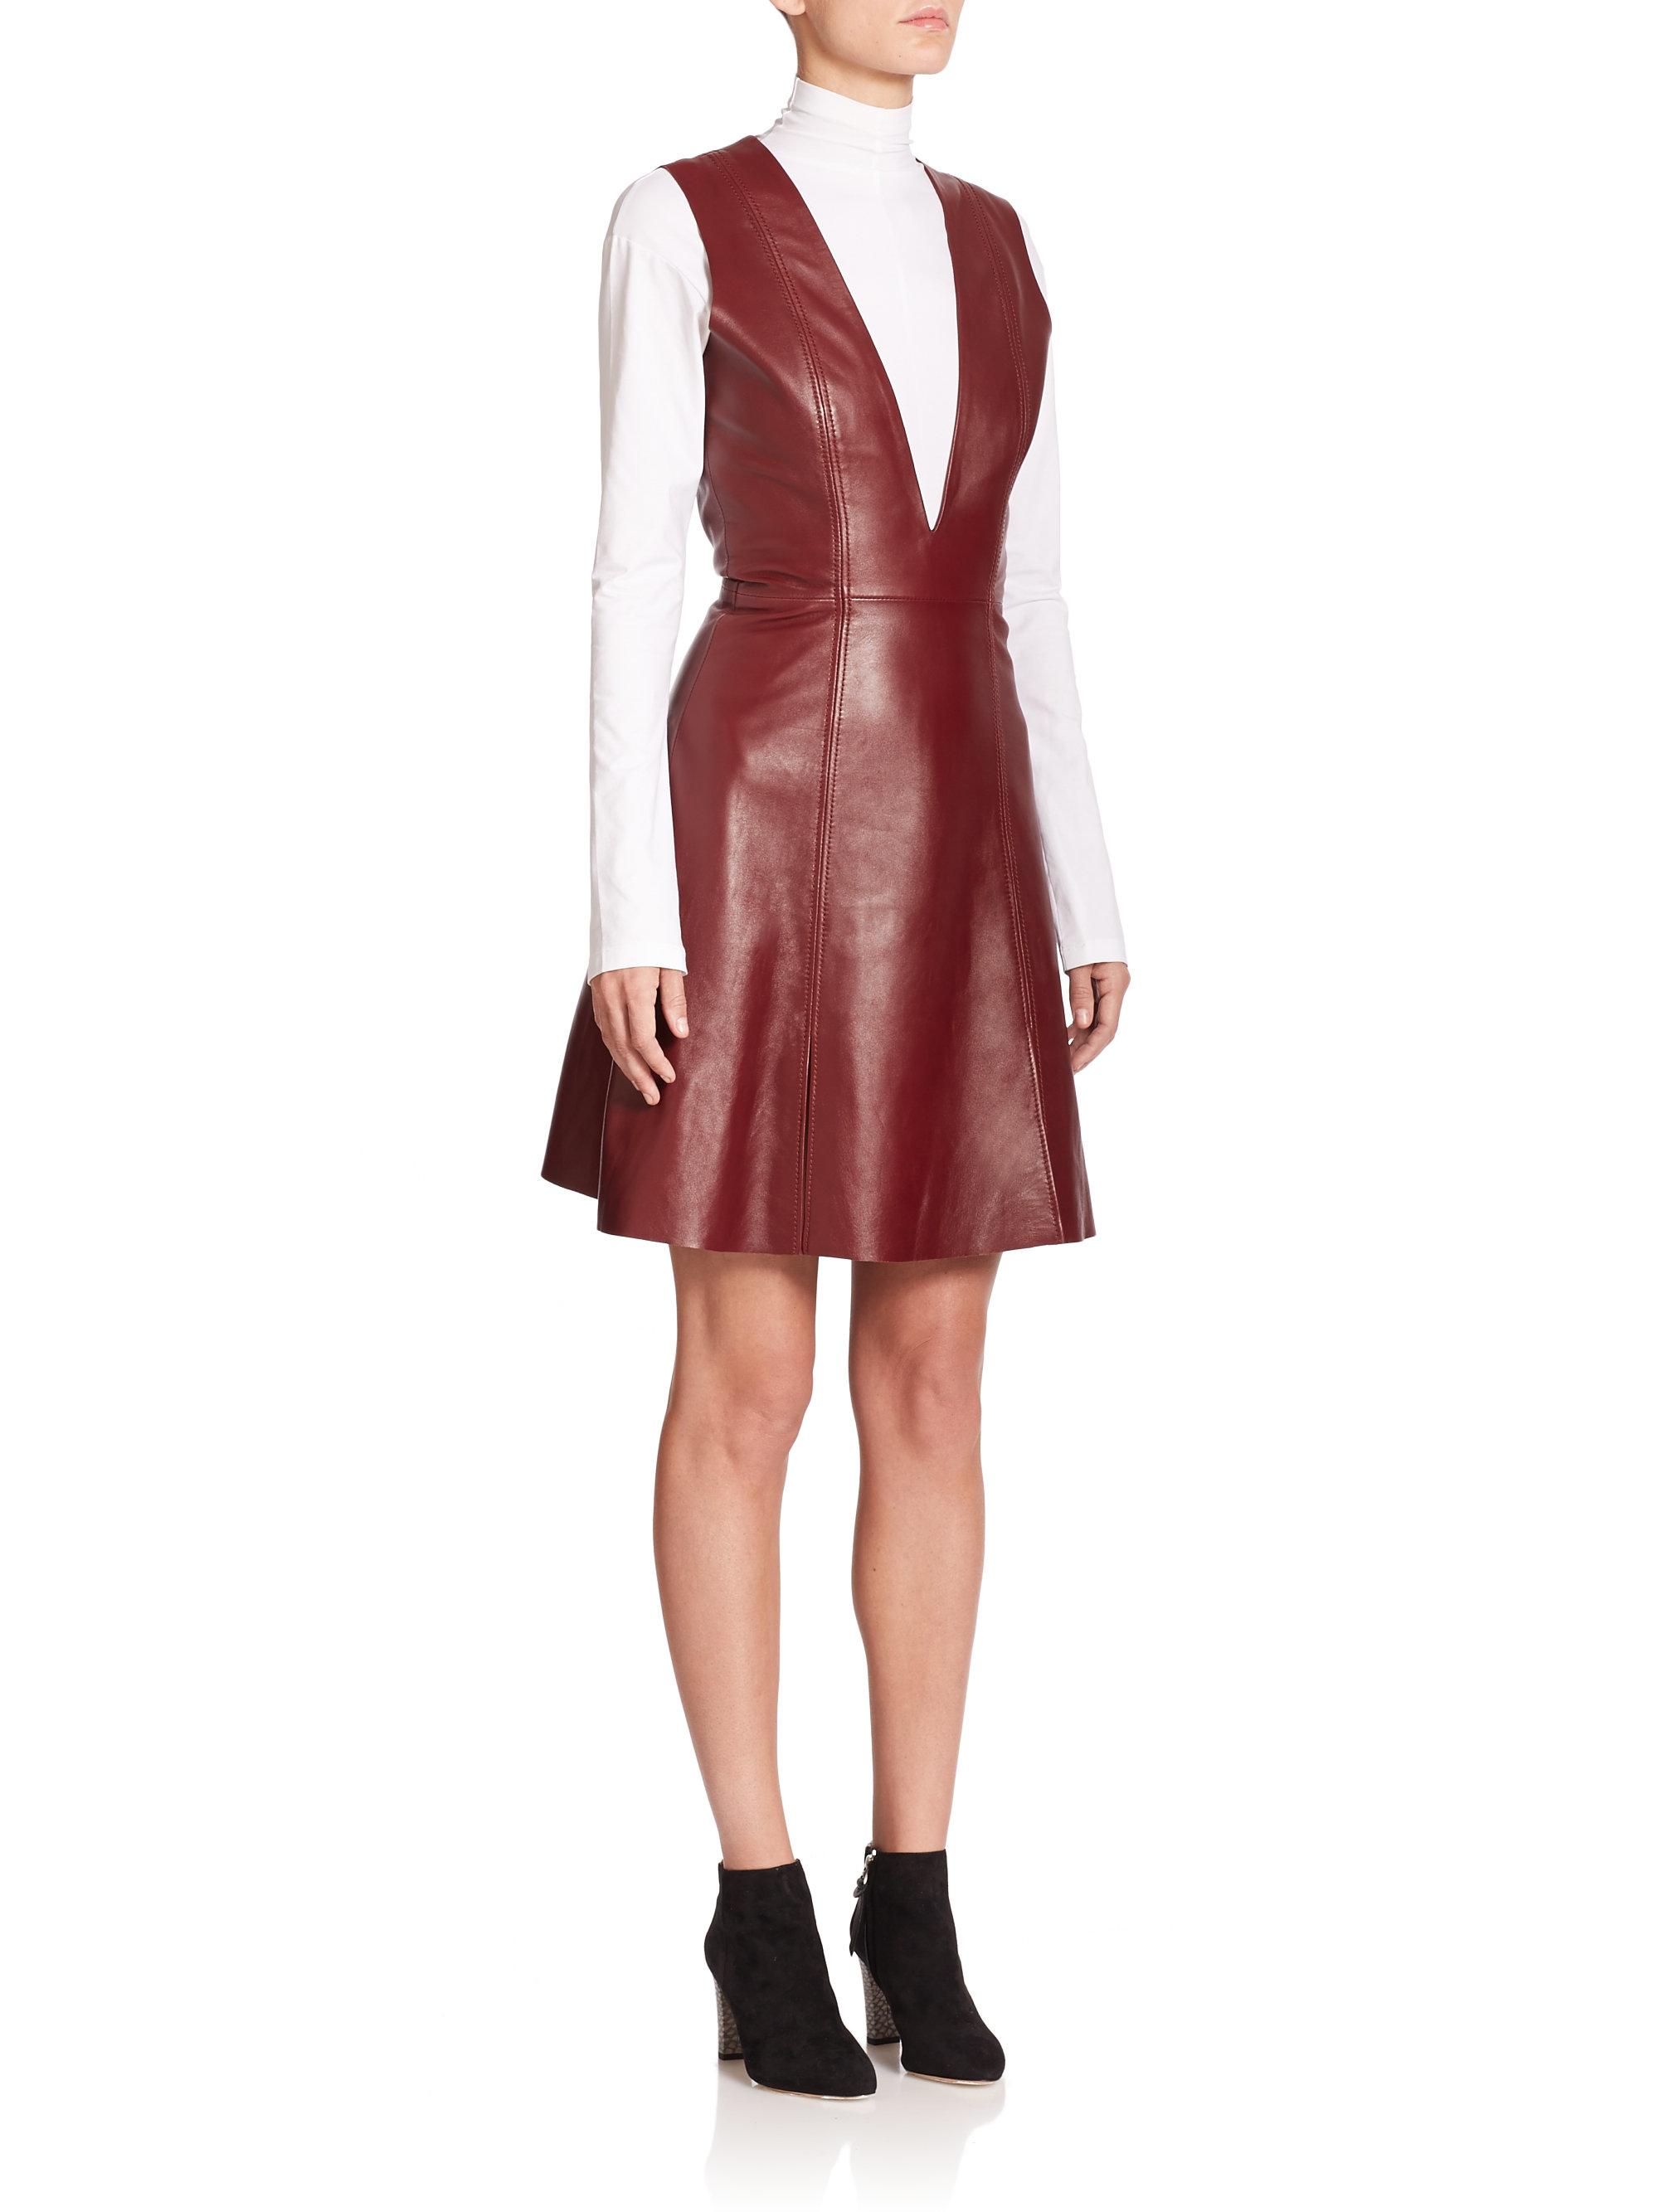 Acne Studios Lavern Flared Leather Dress Lyst